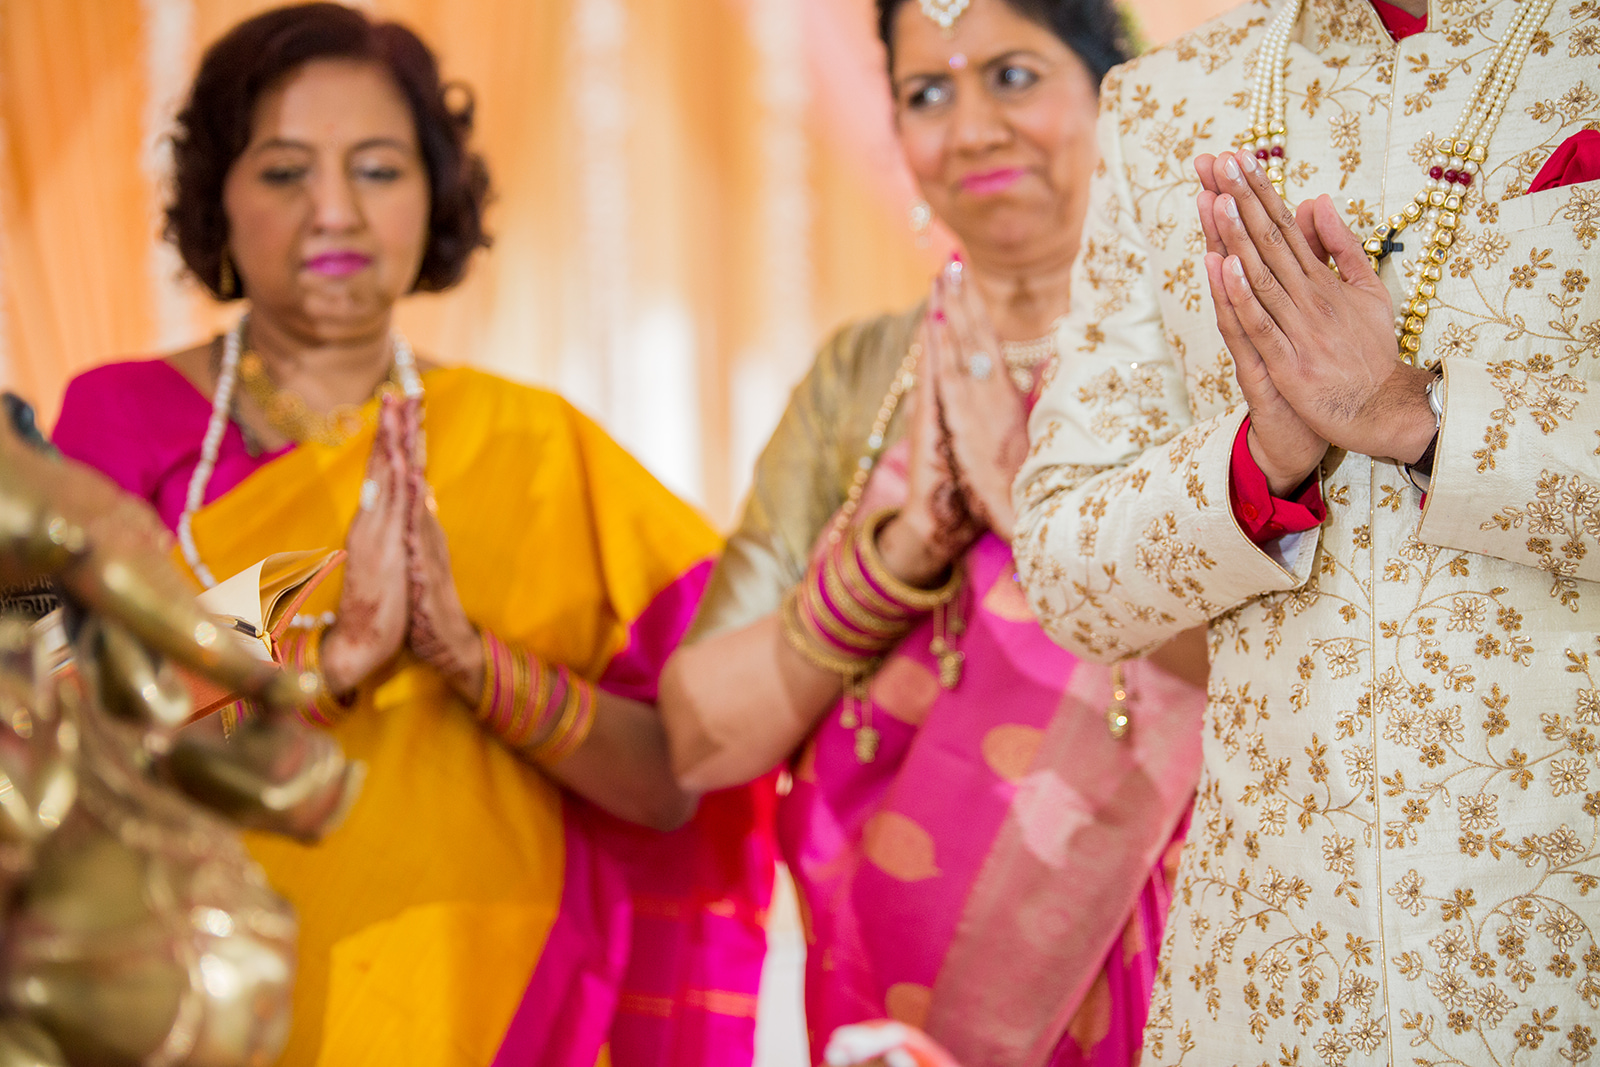 Le Cape Weddings - Sumeet and Chavi - Welcome Ceremony --12.jpg